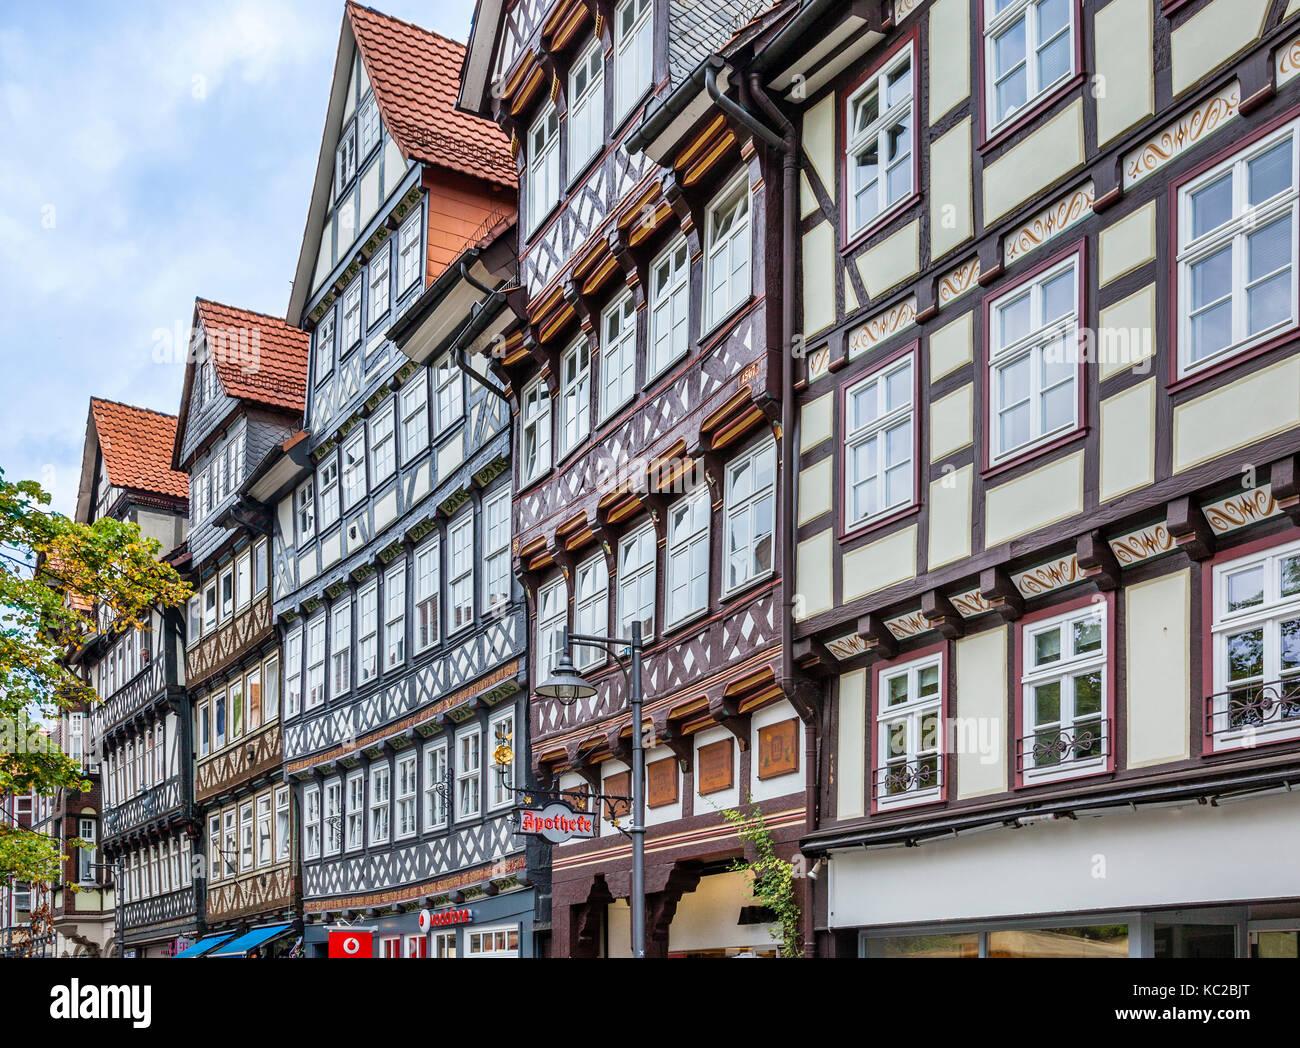 Germany, Lower Saxony, Hann. Münden, medieval half-timbered houses at Lange Strasse Stock Photo